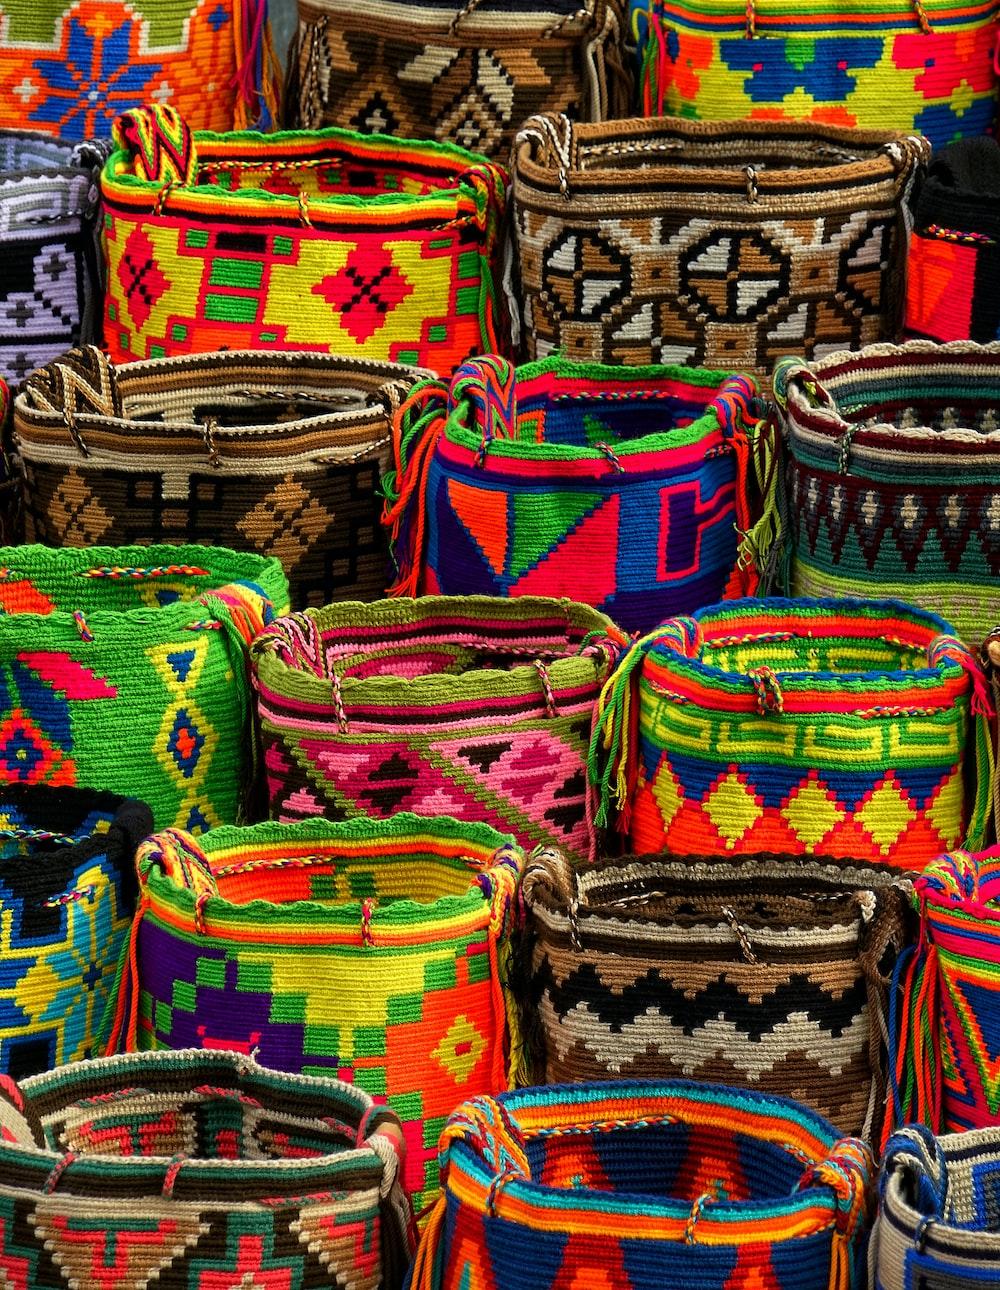 assorted-color woven basket lot